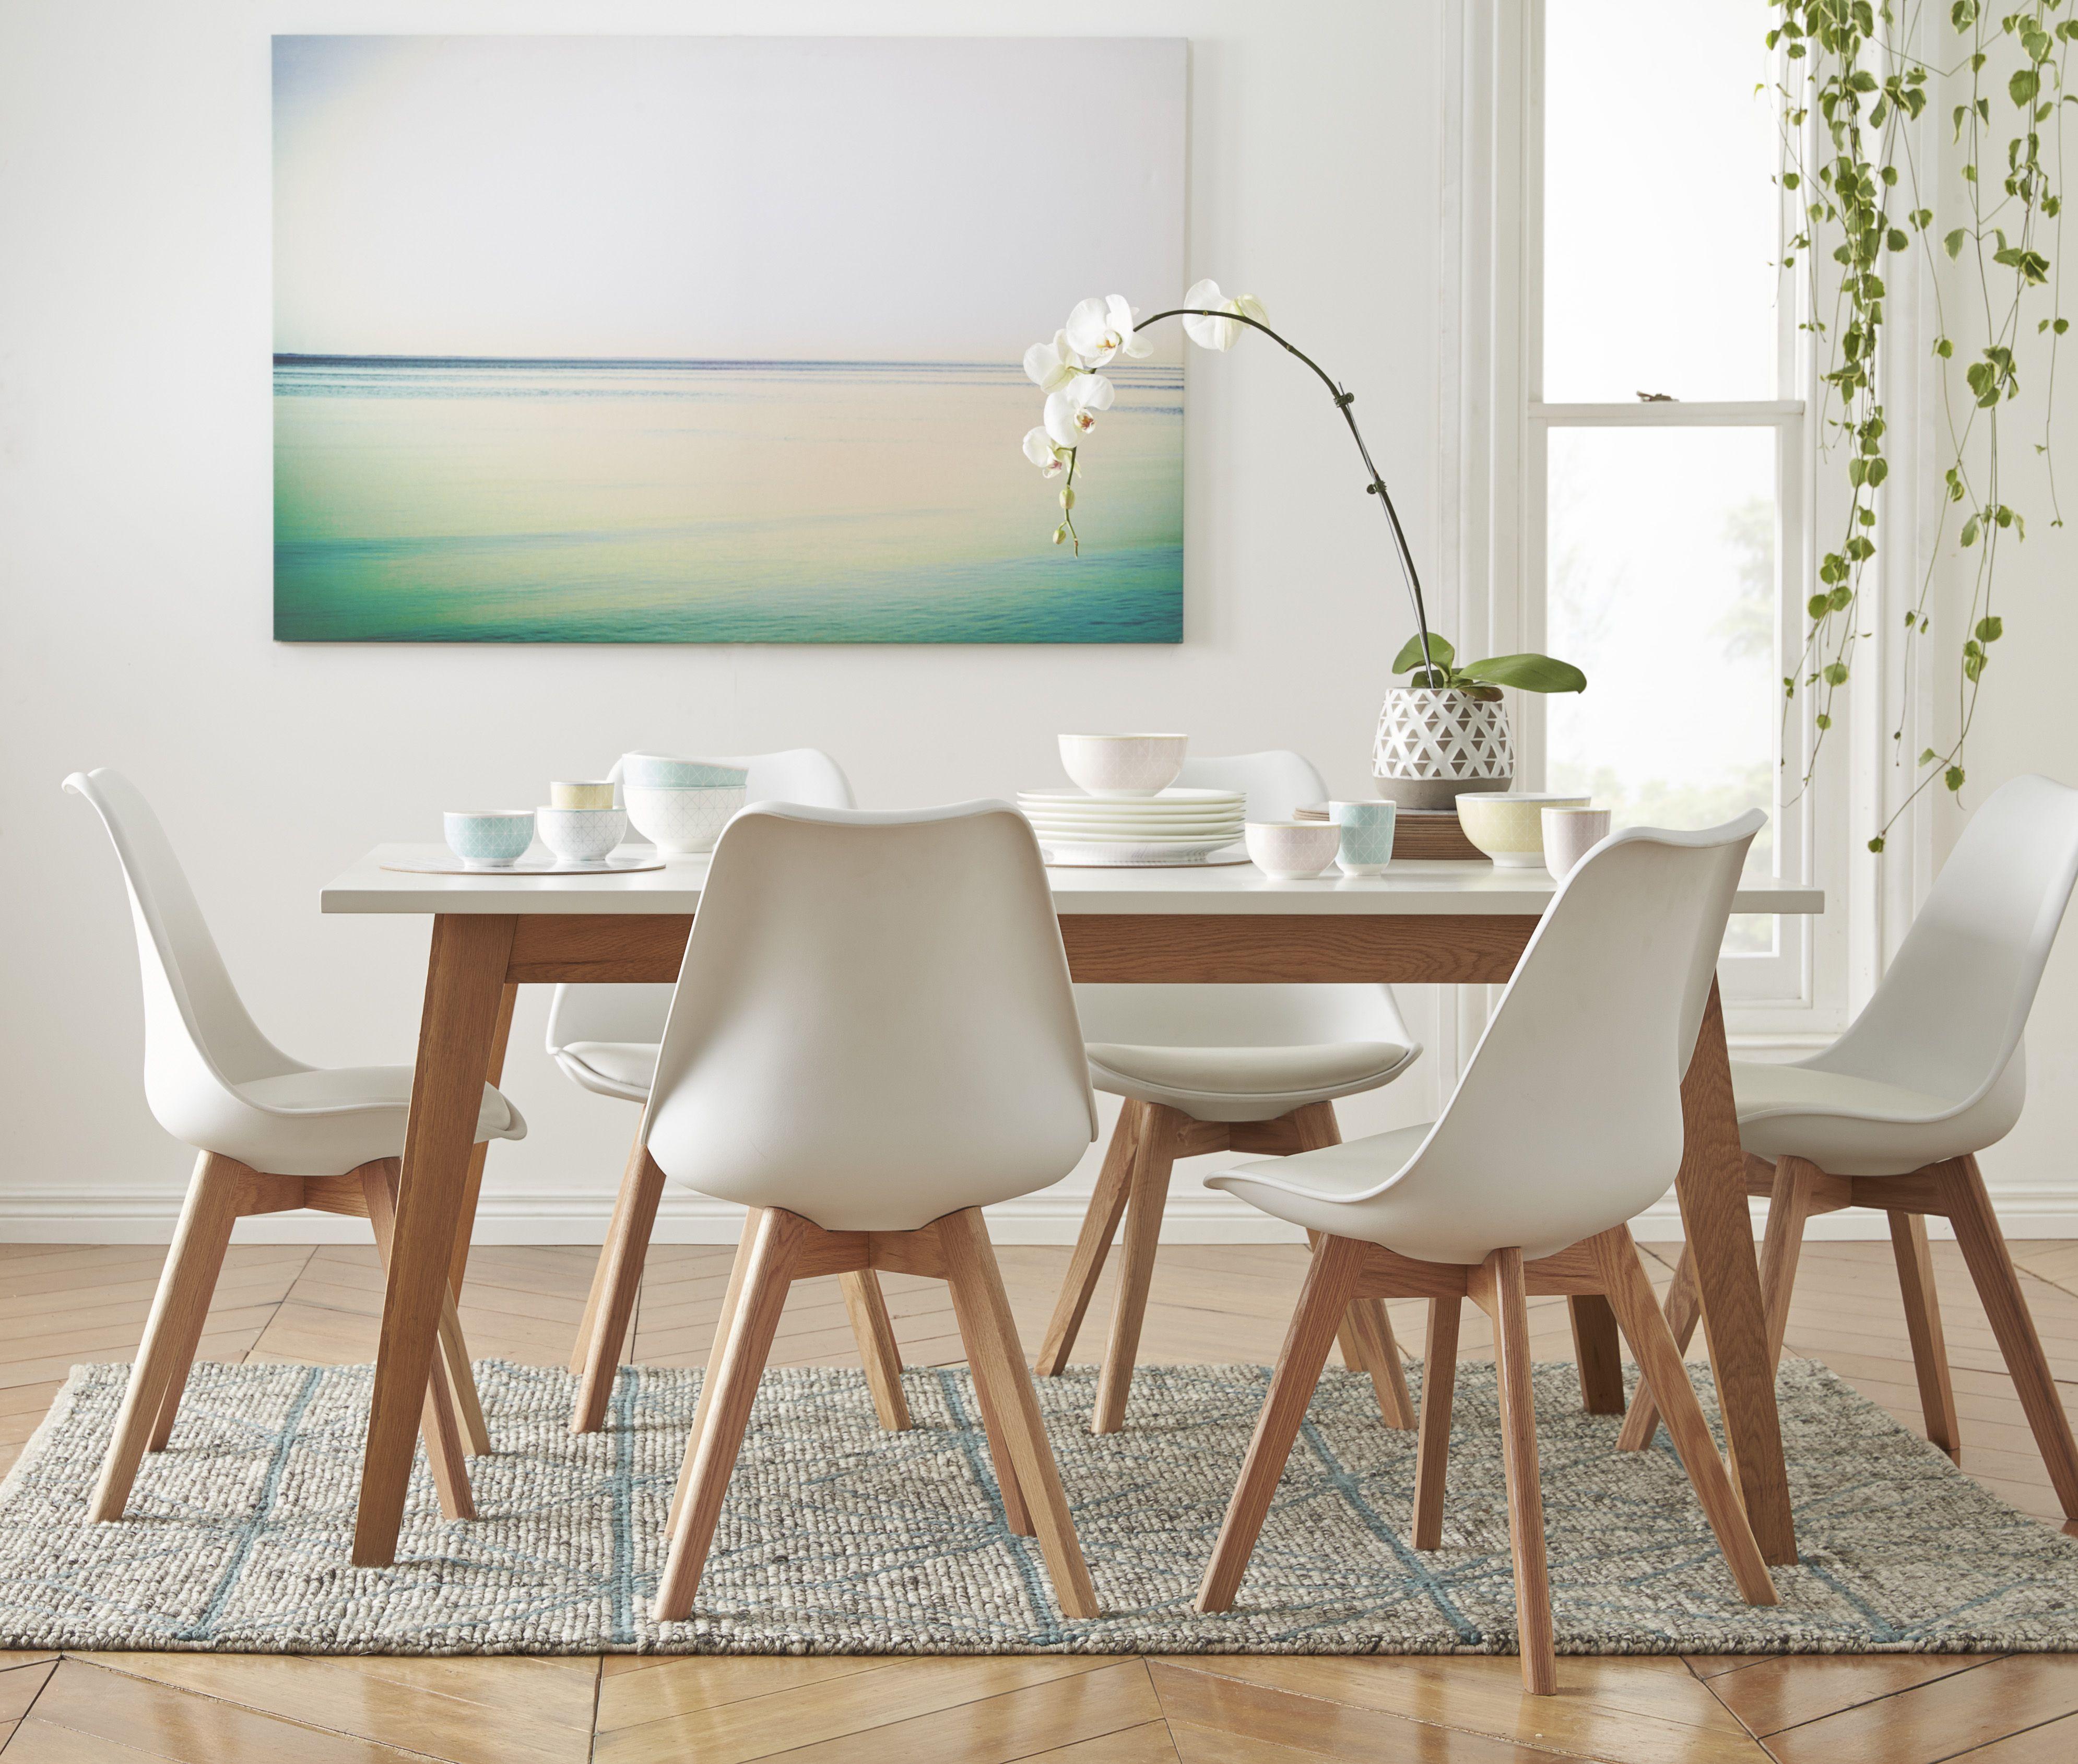 Frieda Dining Table 160x90cm In Oak White 699 Freedomaw15